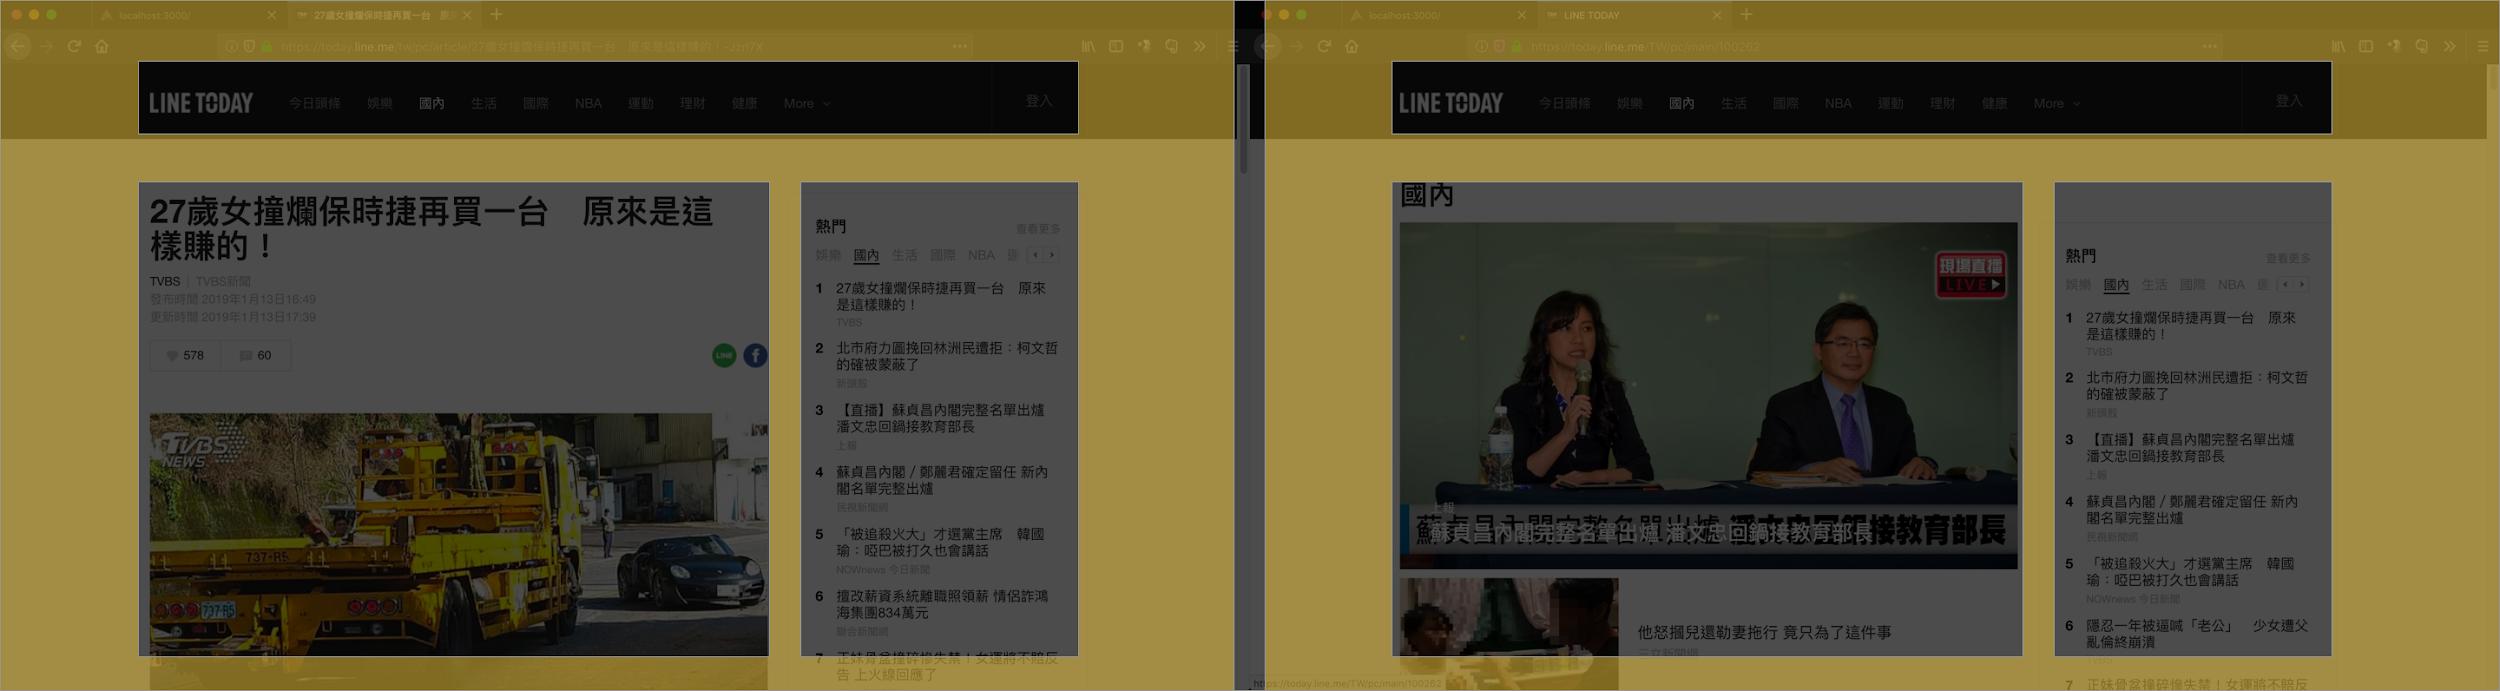 Line Today 網頁佈局示意圖